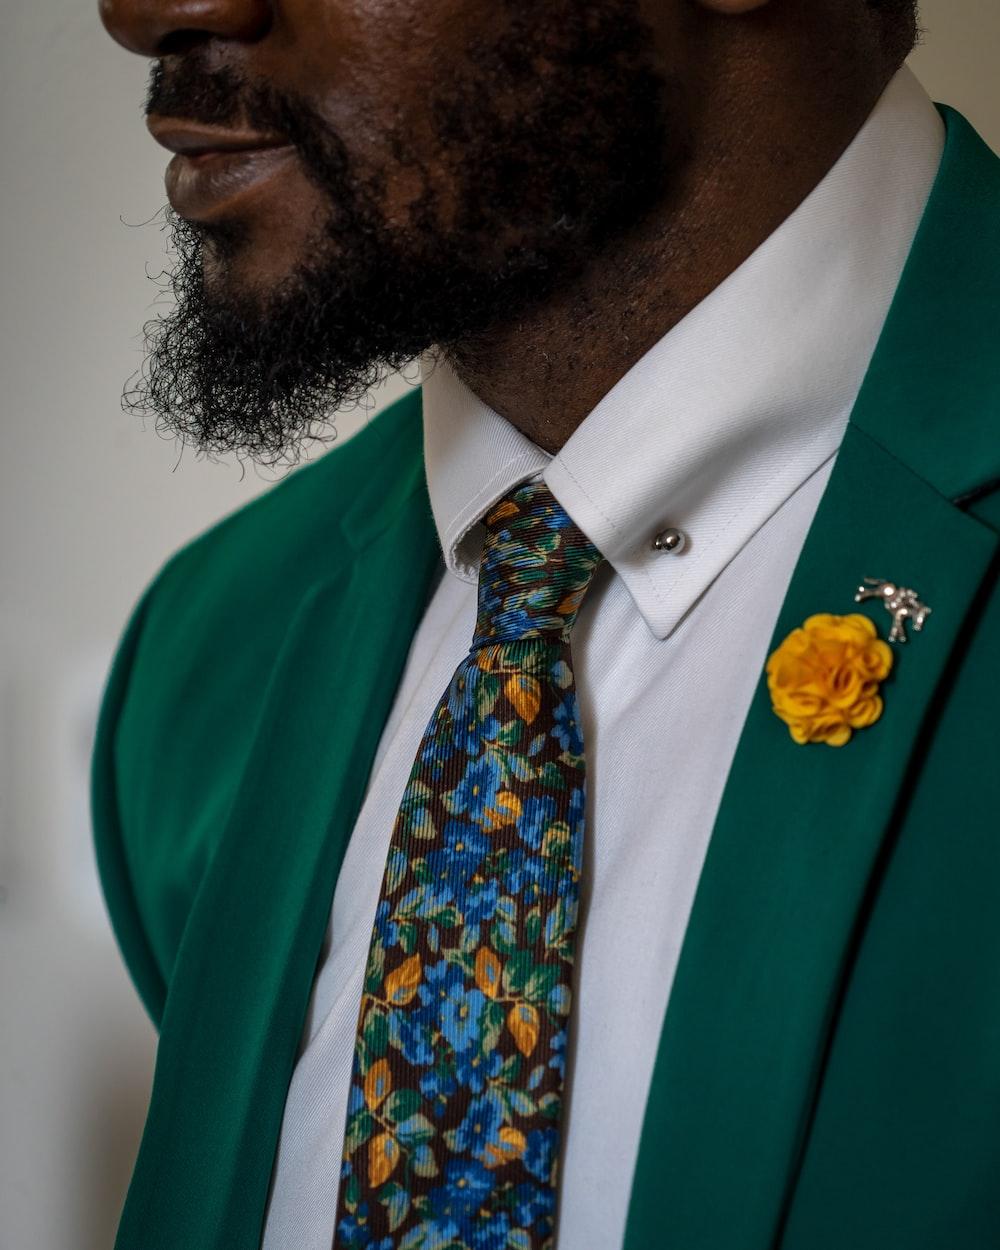 person wearing green dress shirt close-up photography